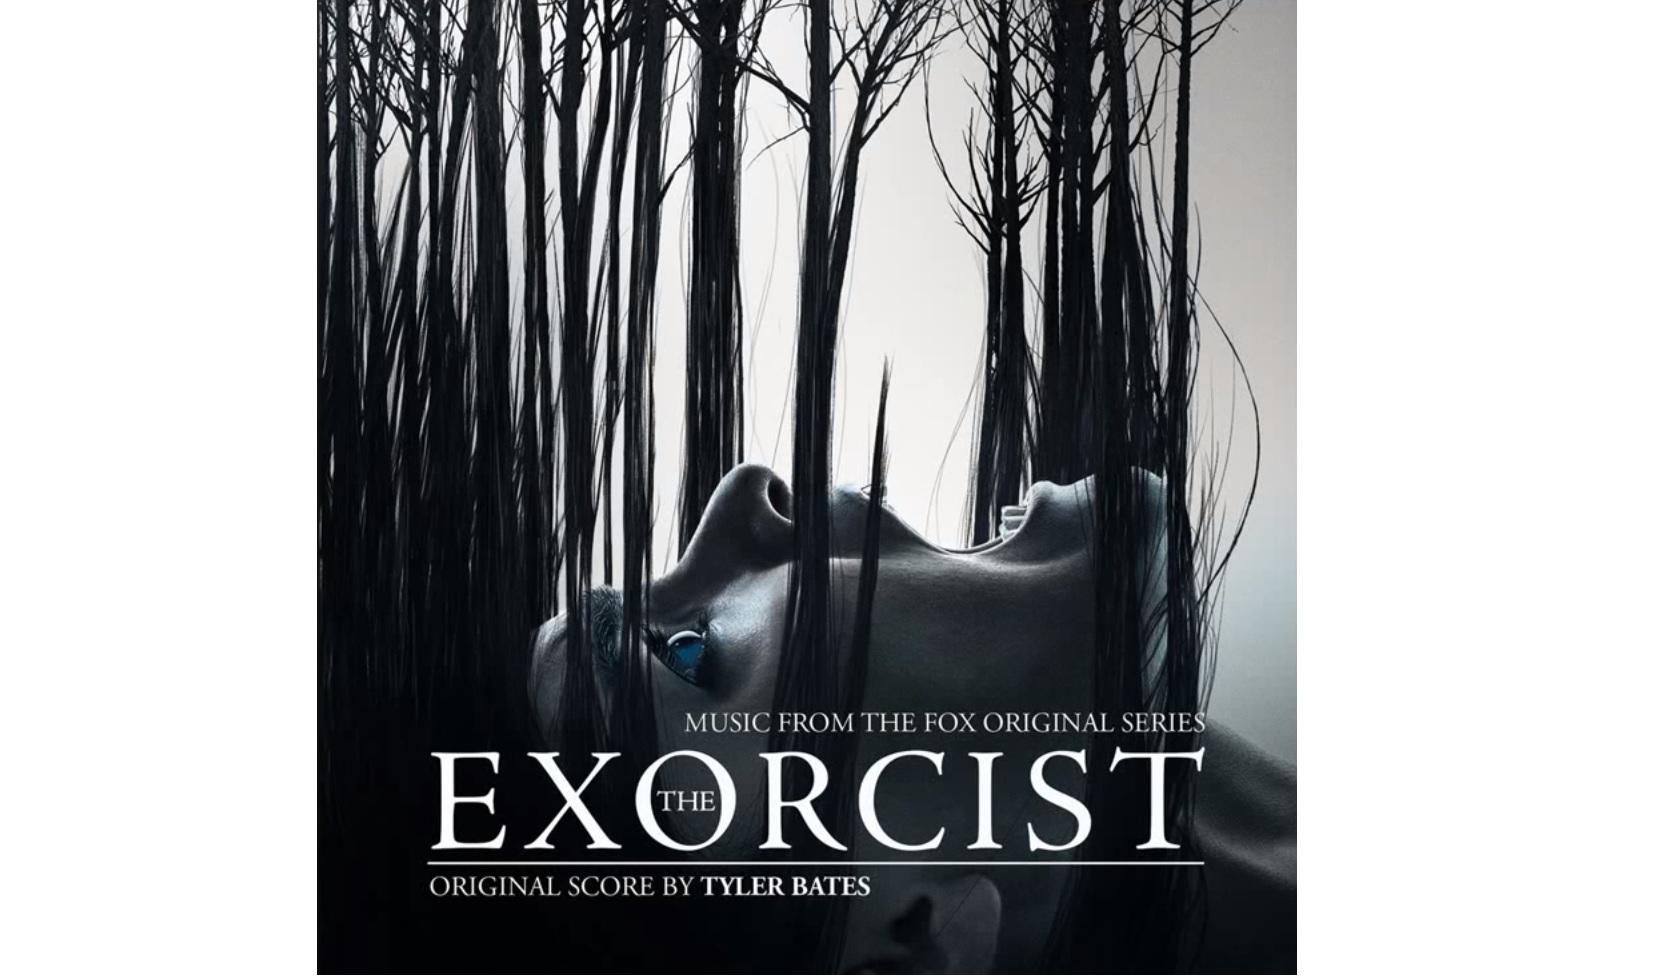 The Exorcist (Serie de TV) – Soundtrack, Tráiler